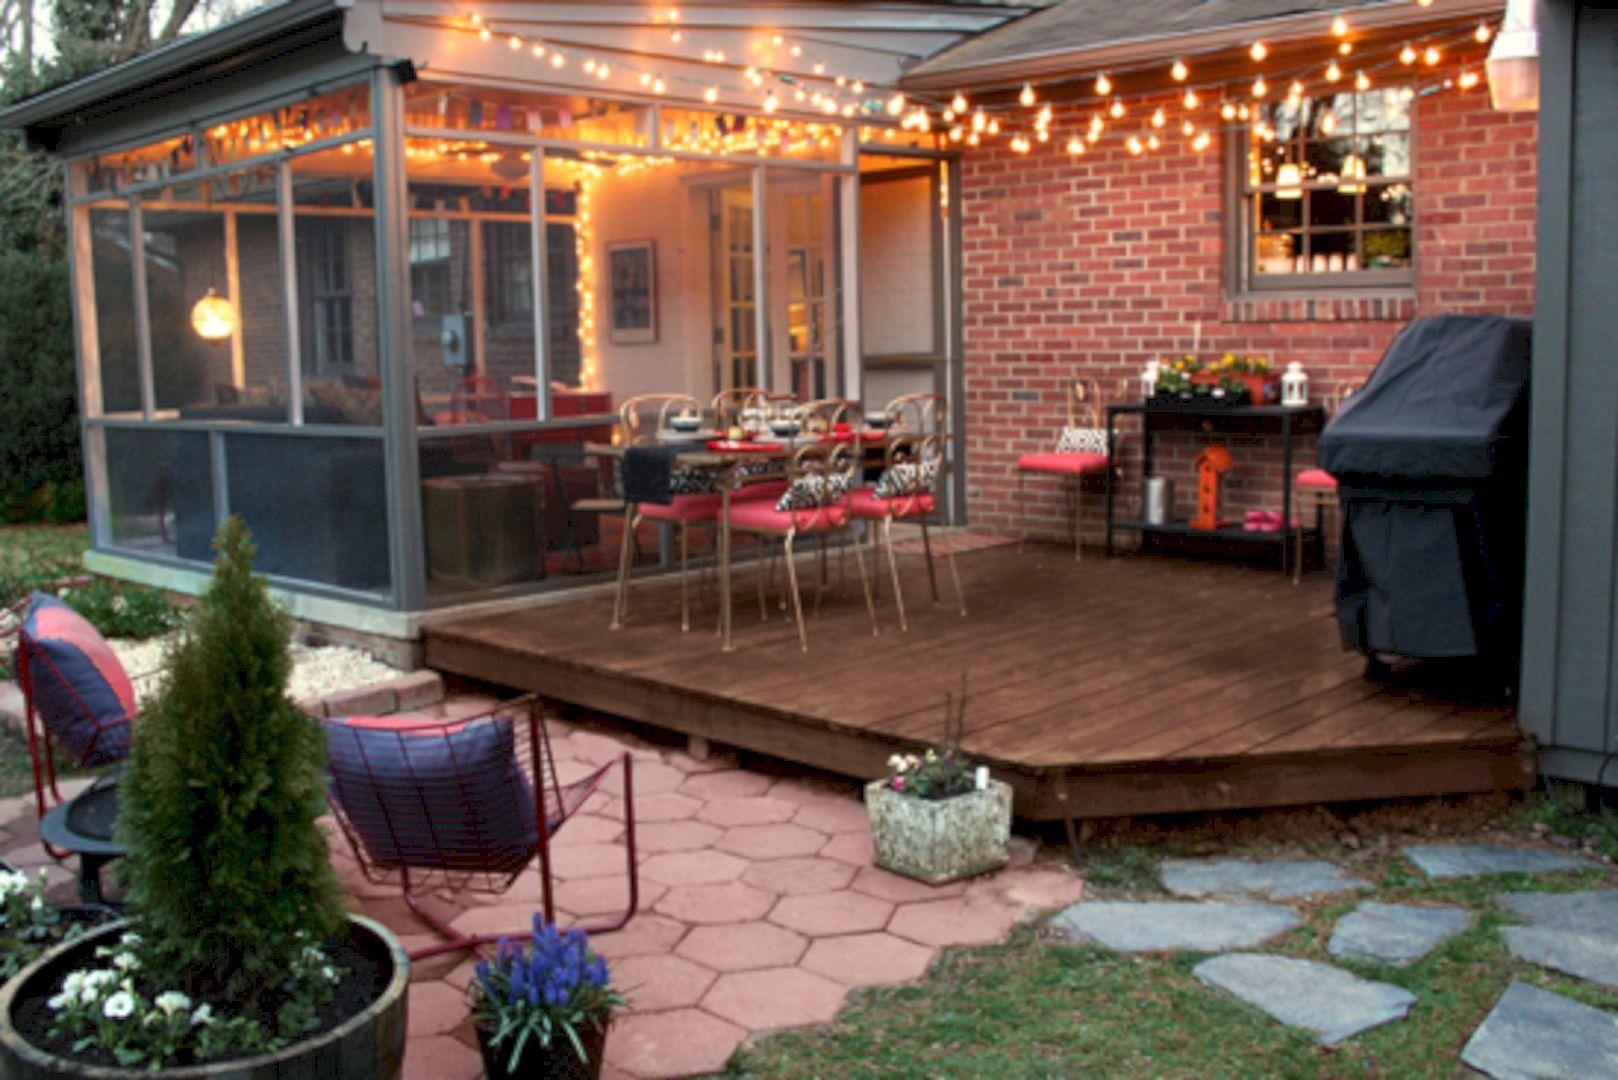 8 Ways To Have More Appealing Screened Porch Deck Patio Deck Designs Patio Design Cozy Backyard